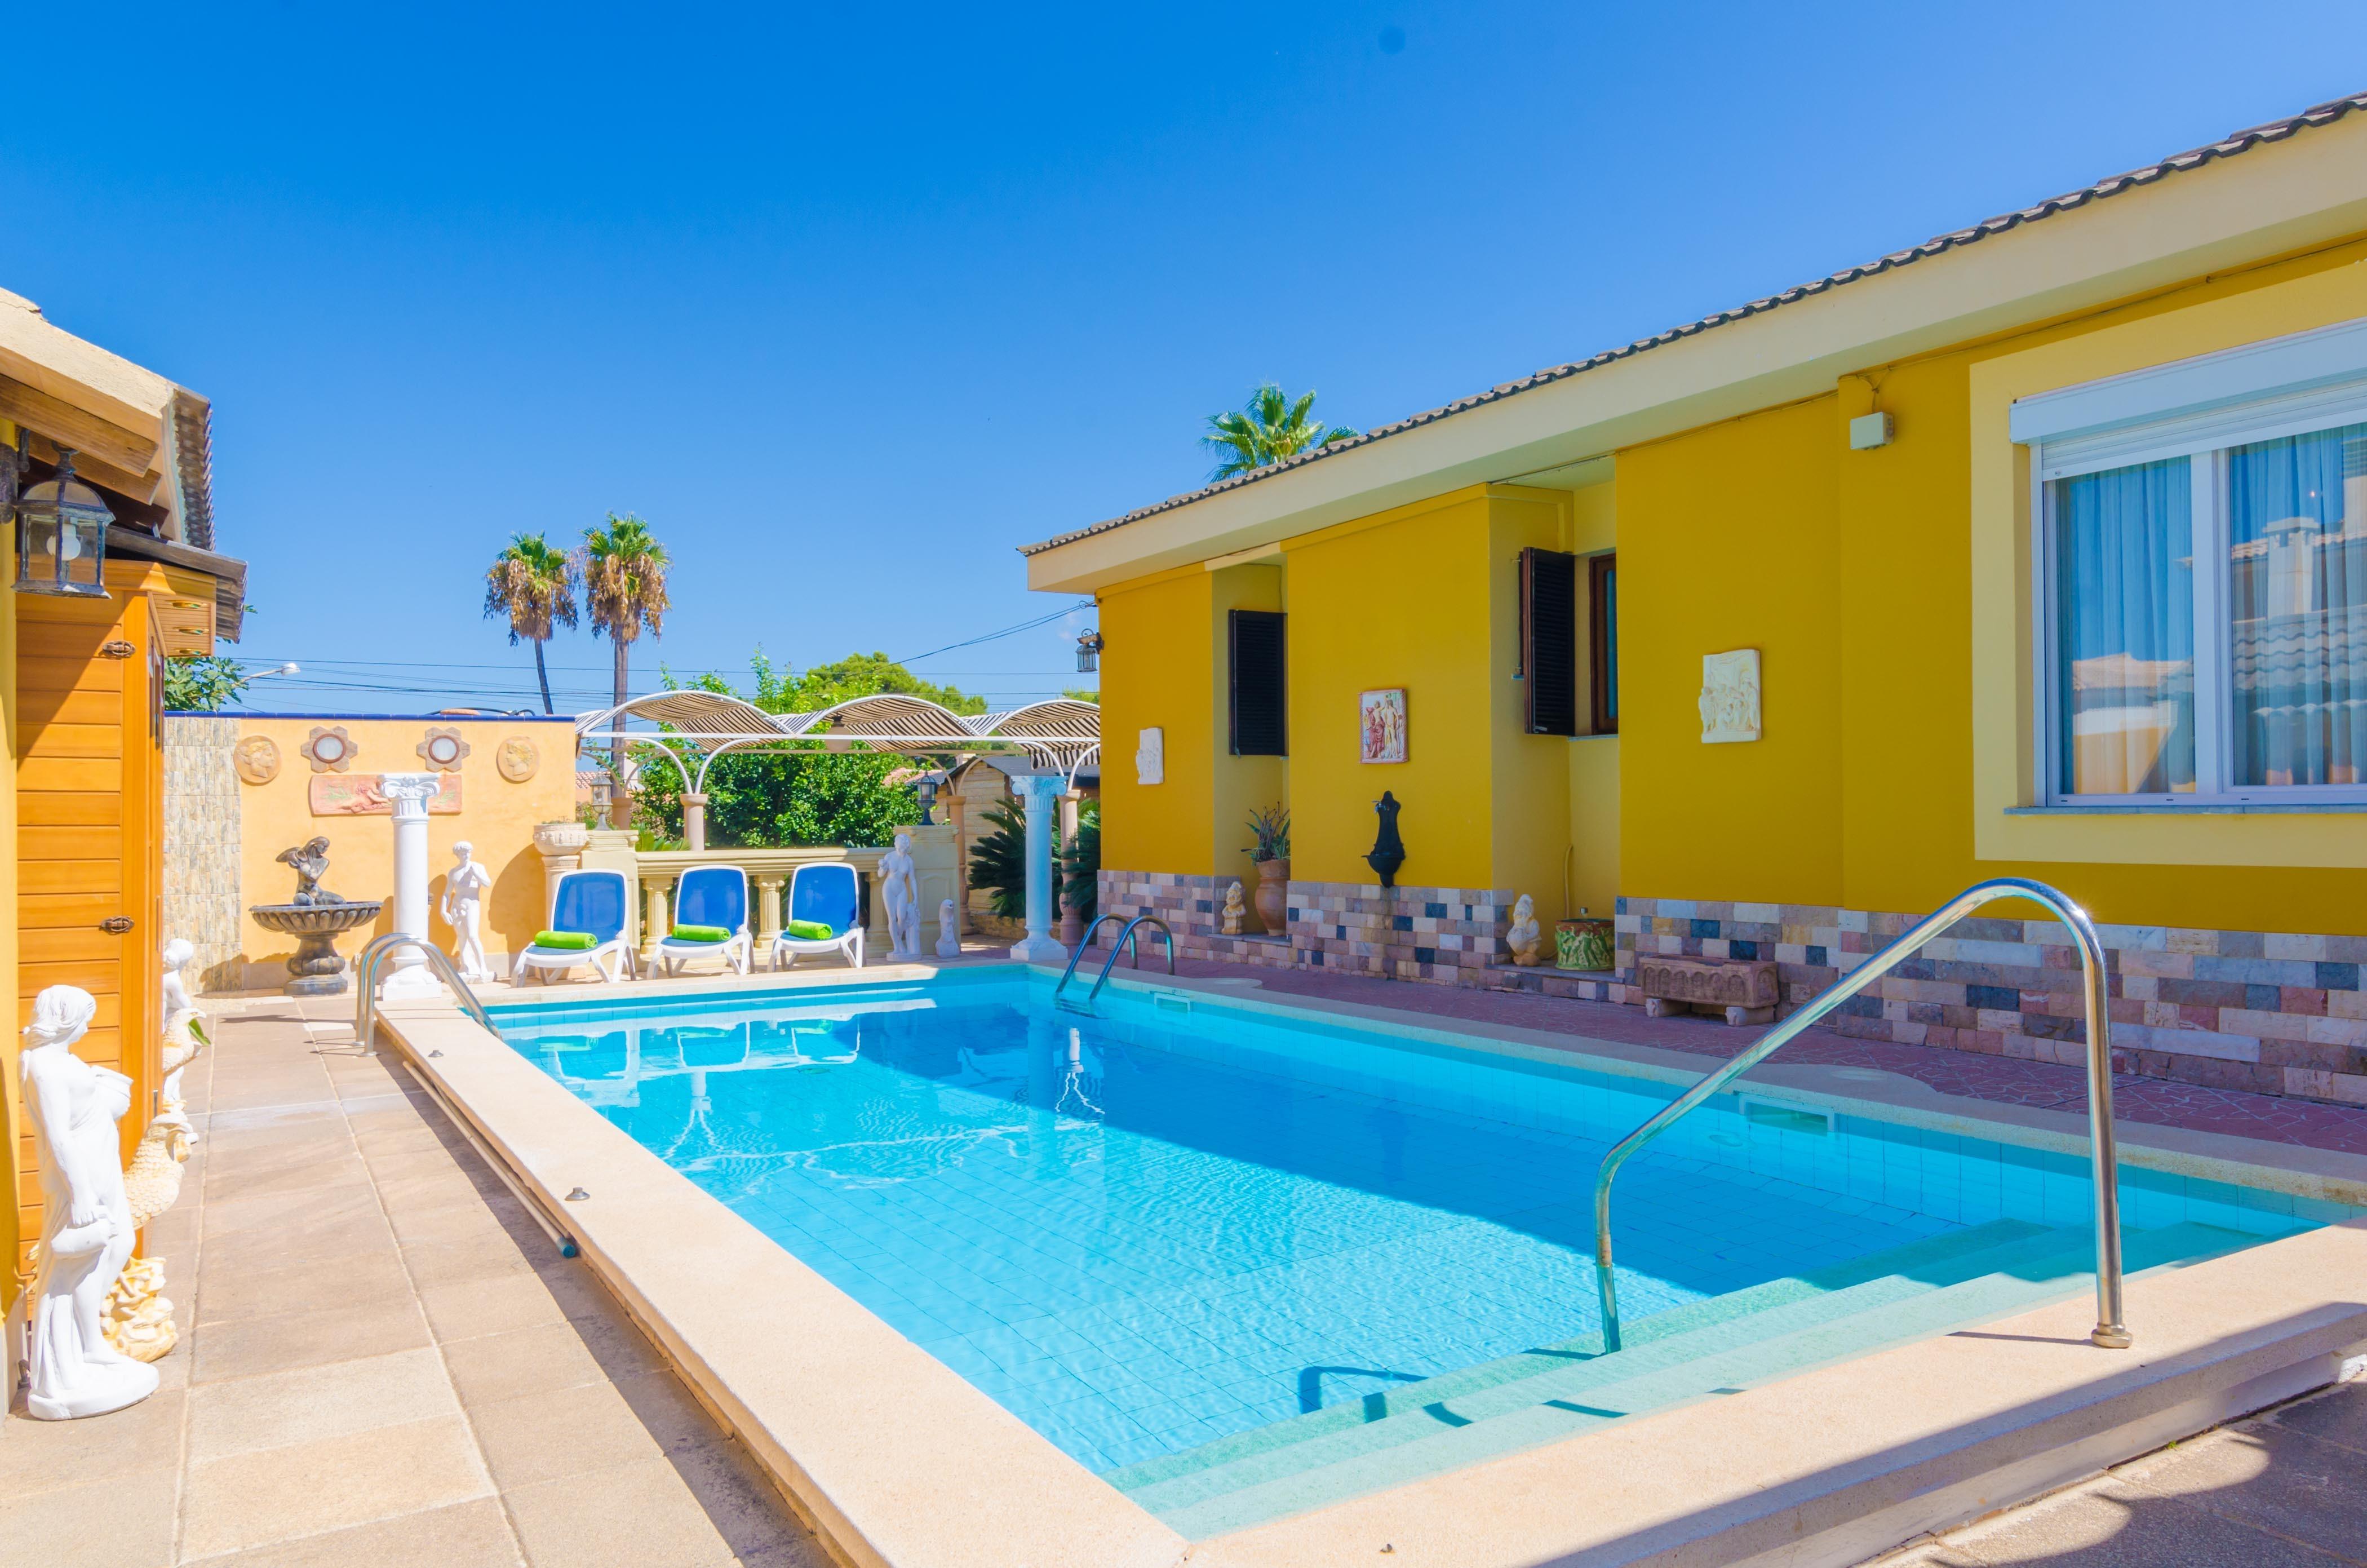 Ferienhaus CAN GORI (2296828), Badia Gran, Mallorca, Balearische Inseln, Spanien, Bild 3